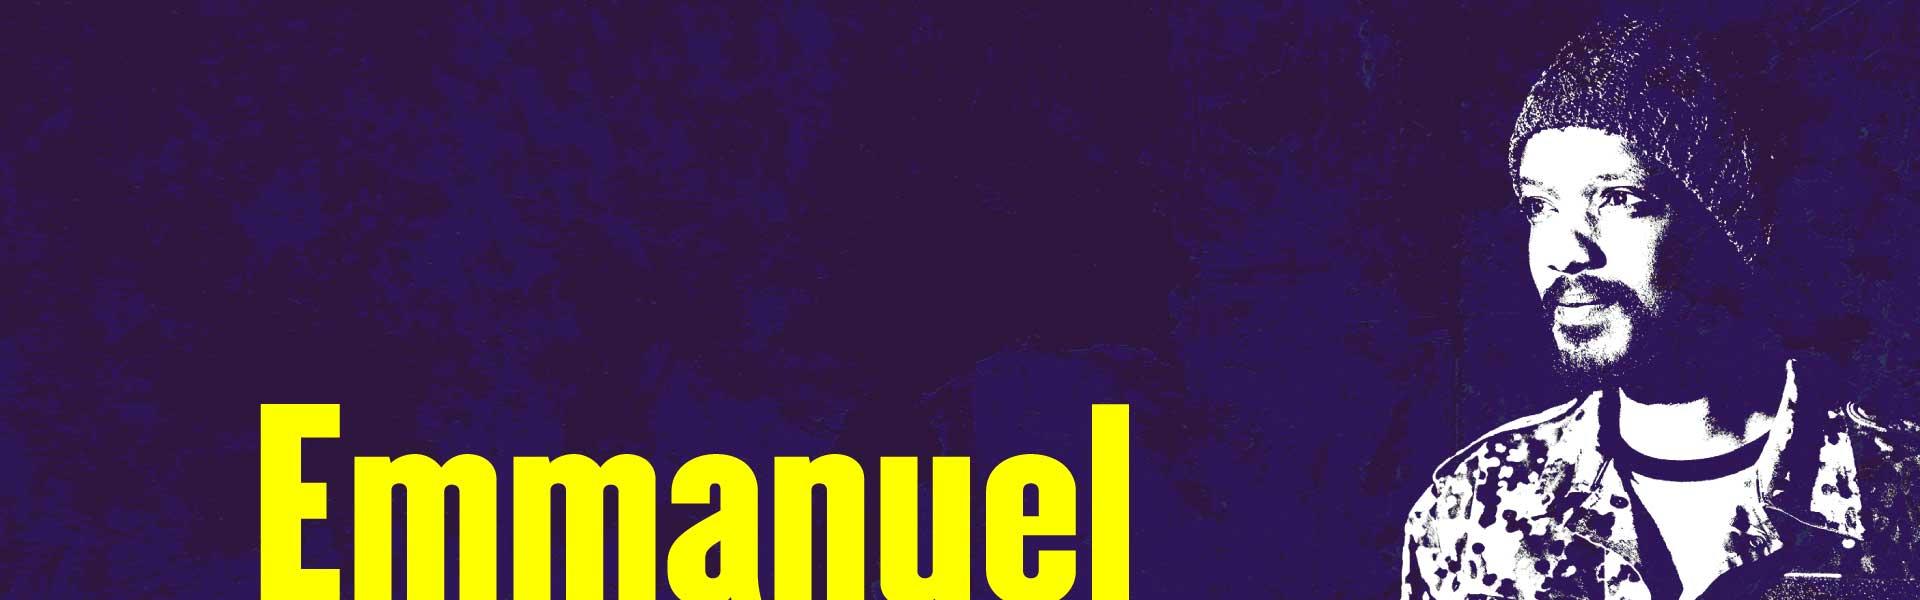 "<a href=""http://hiddenrochdale.co.uk/emmanuel/"">Emmanuel</a><br/><p>"